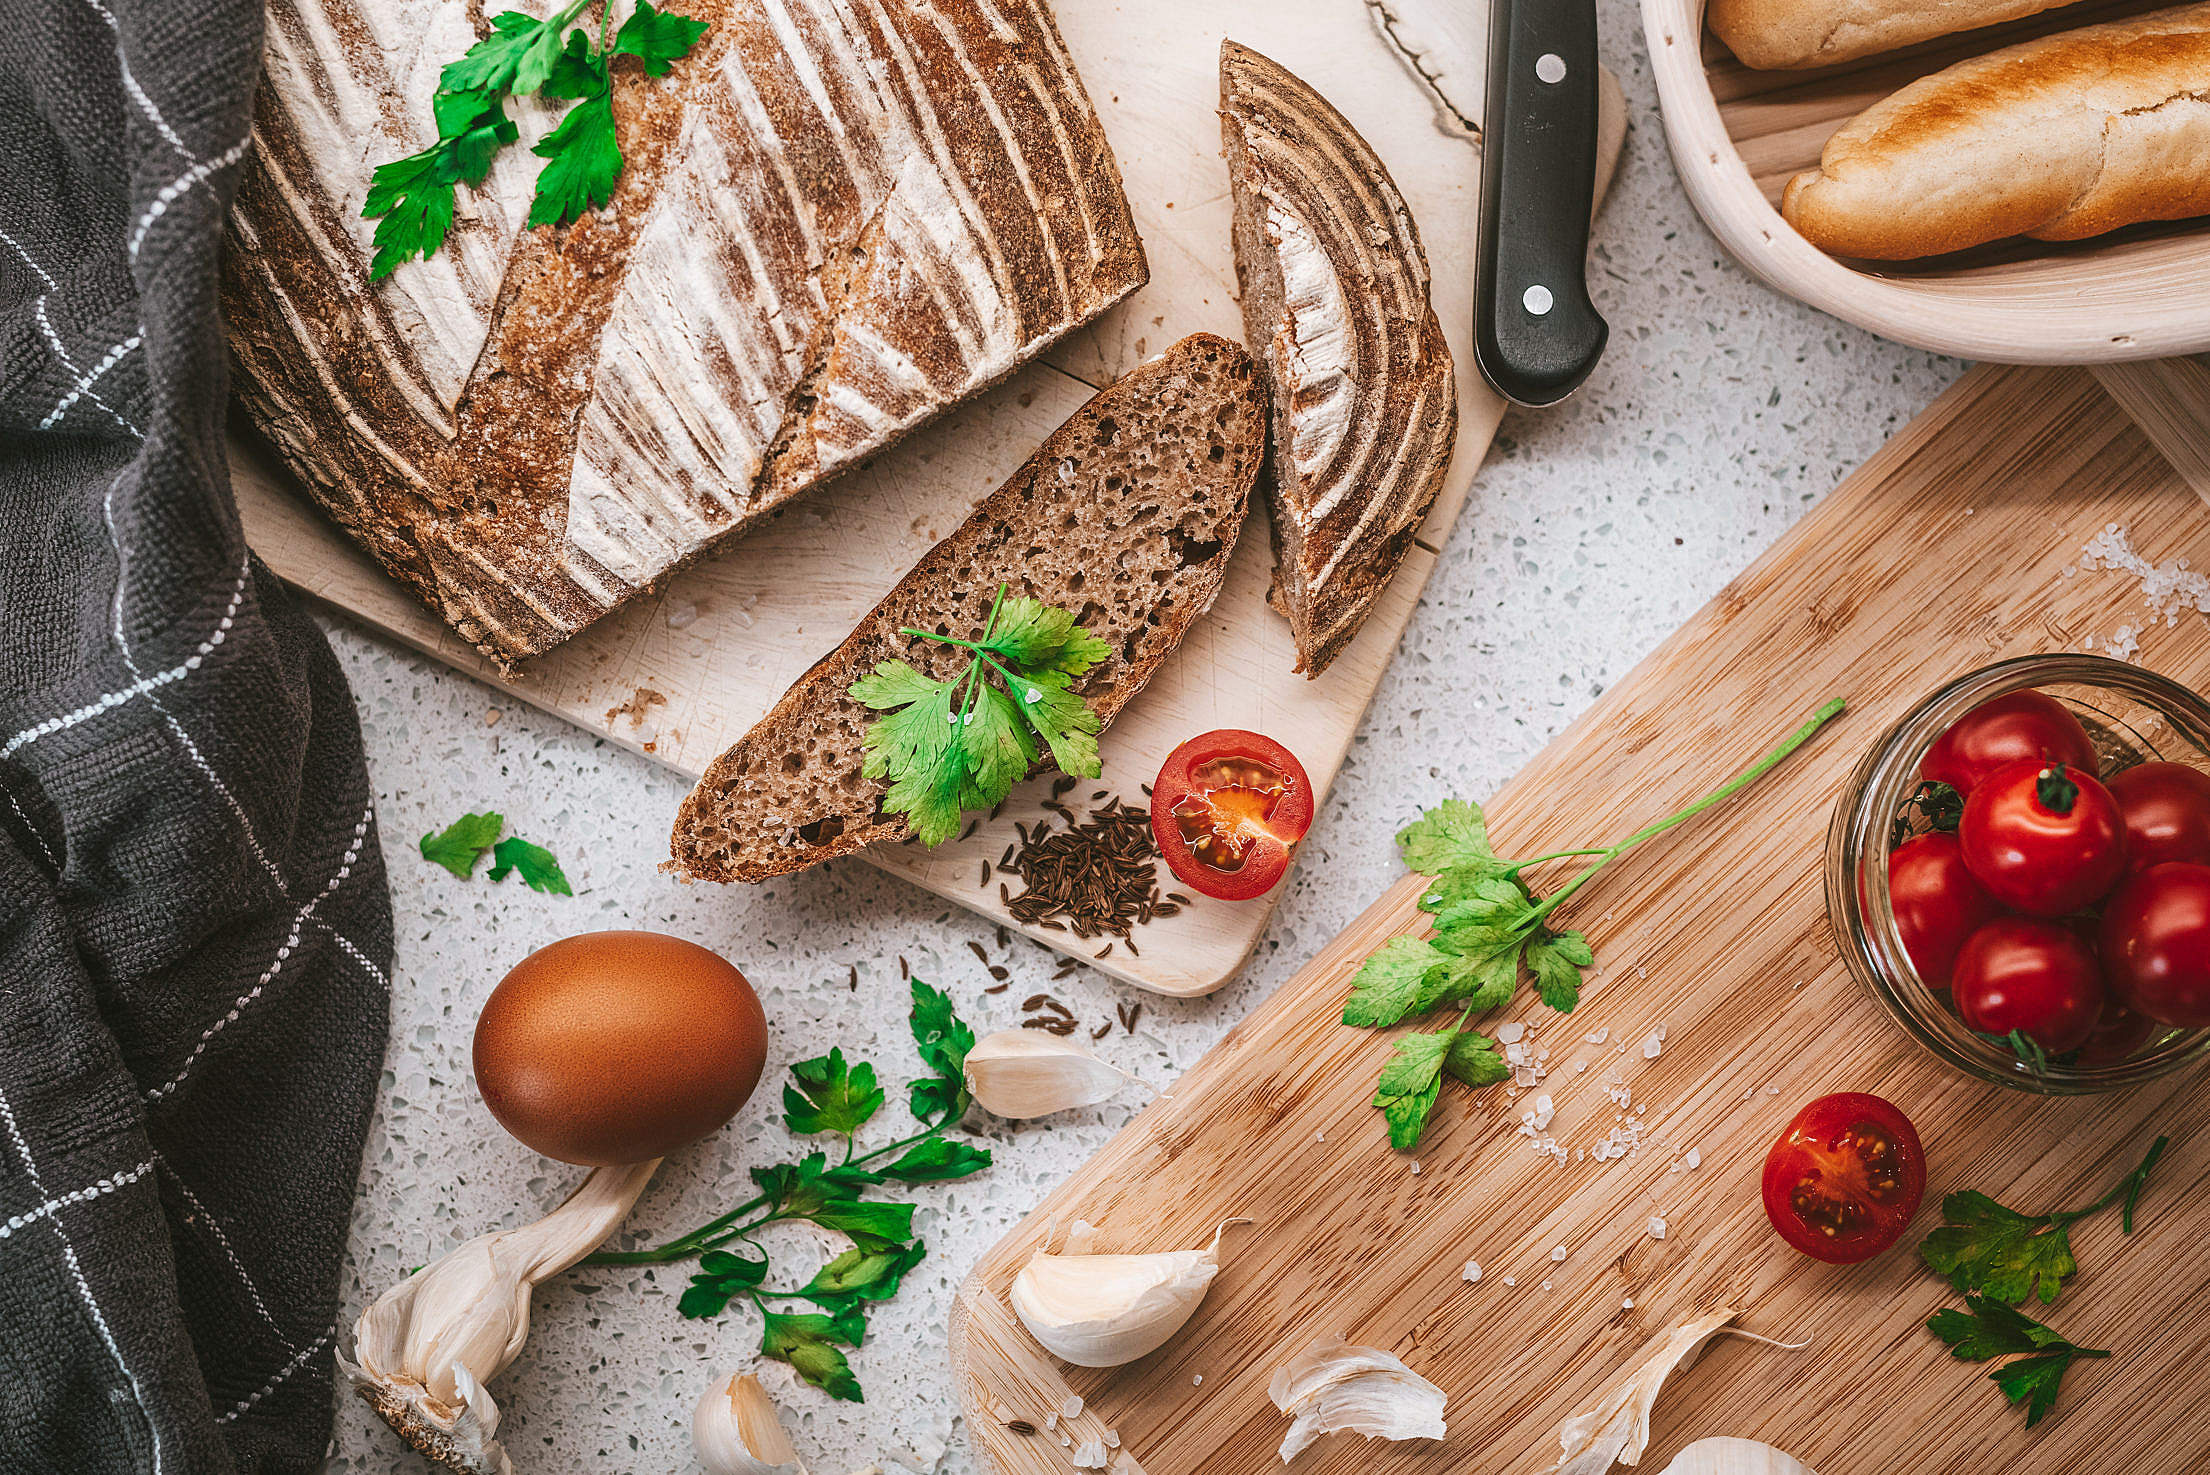 Homemade Fresh Bread Free Stock Photo